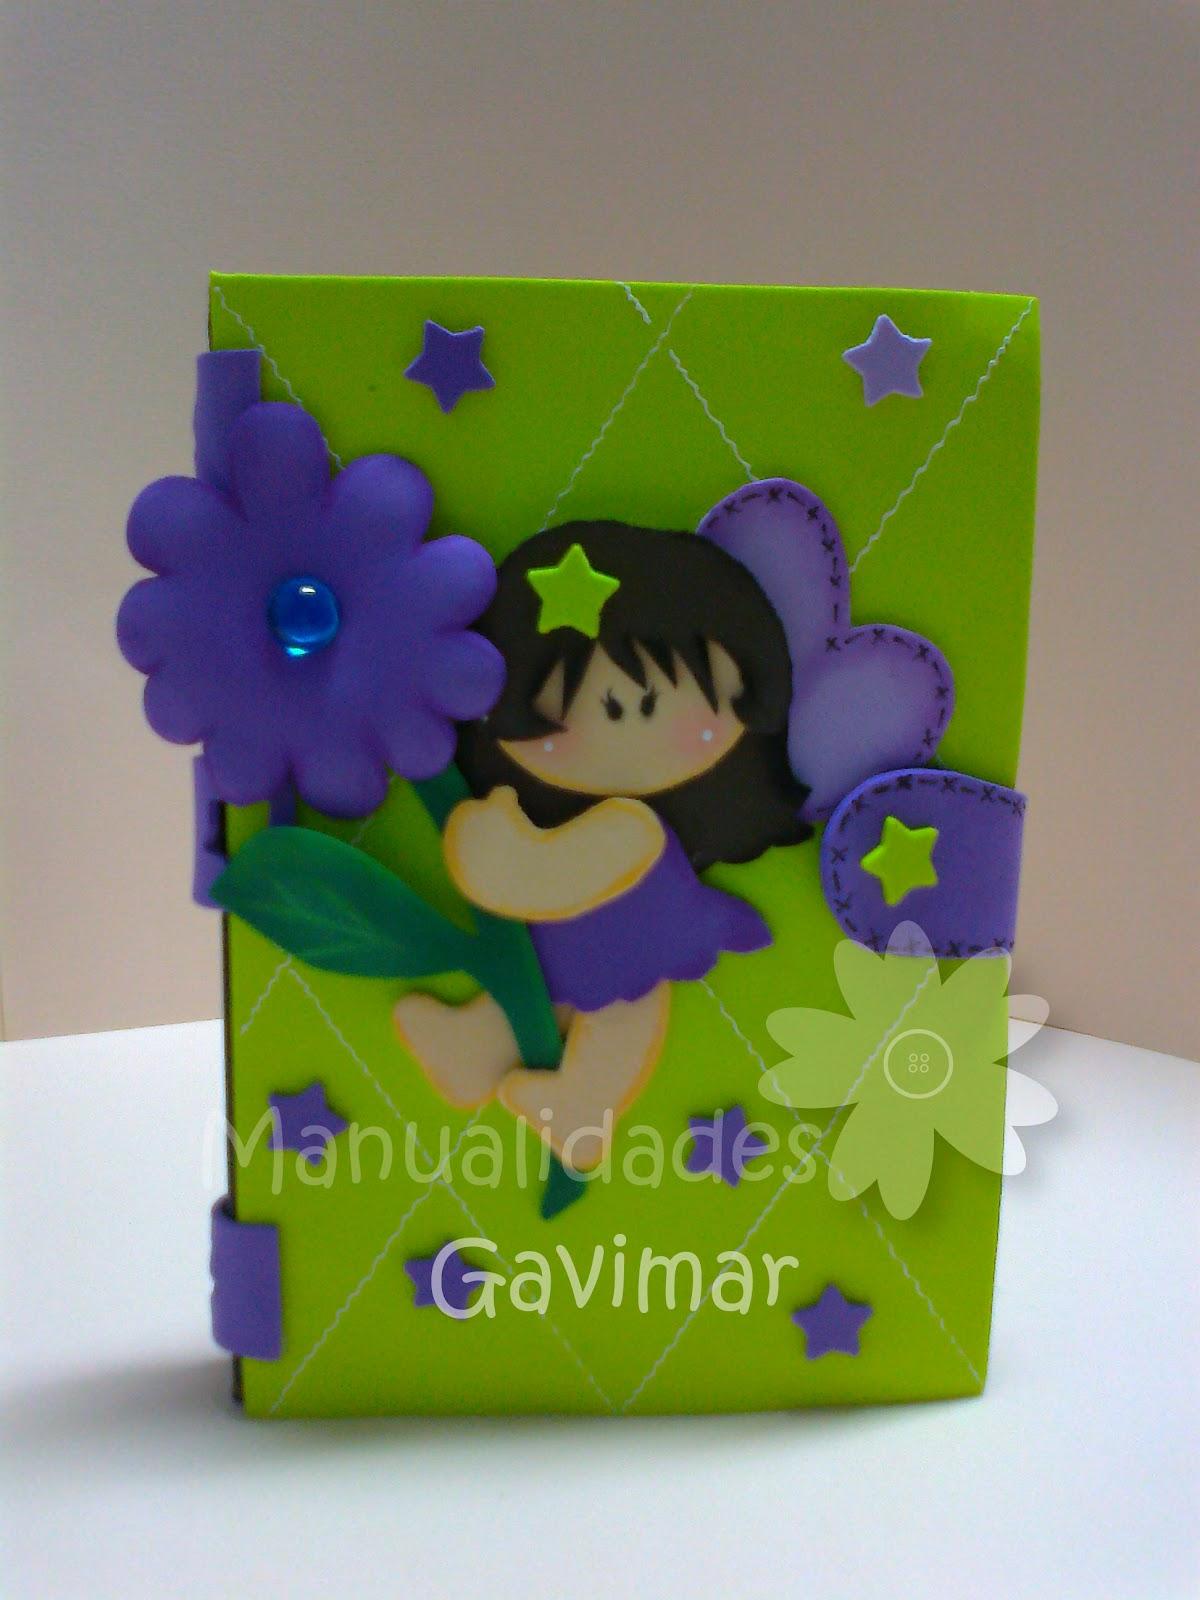 Manualidades gavimar libreta decorada foami mini - Decoracion goma eva infantil ...